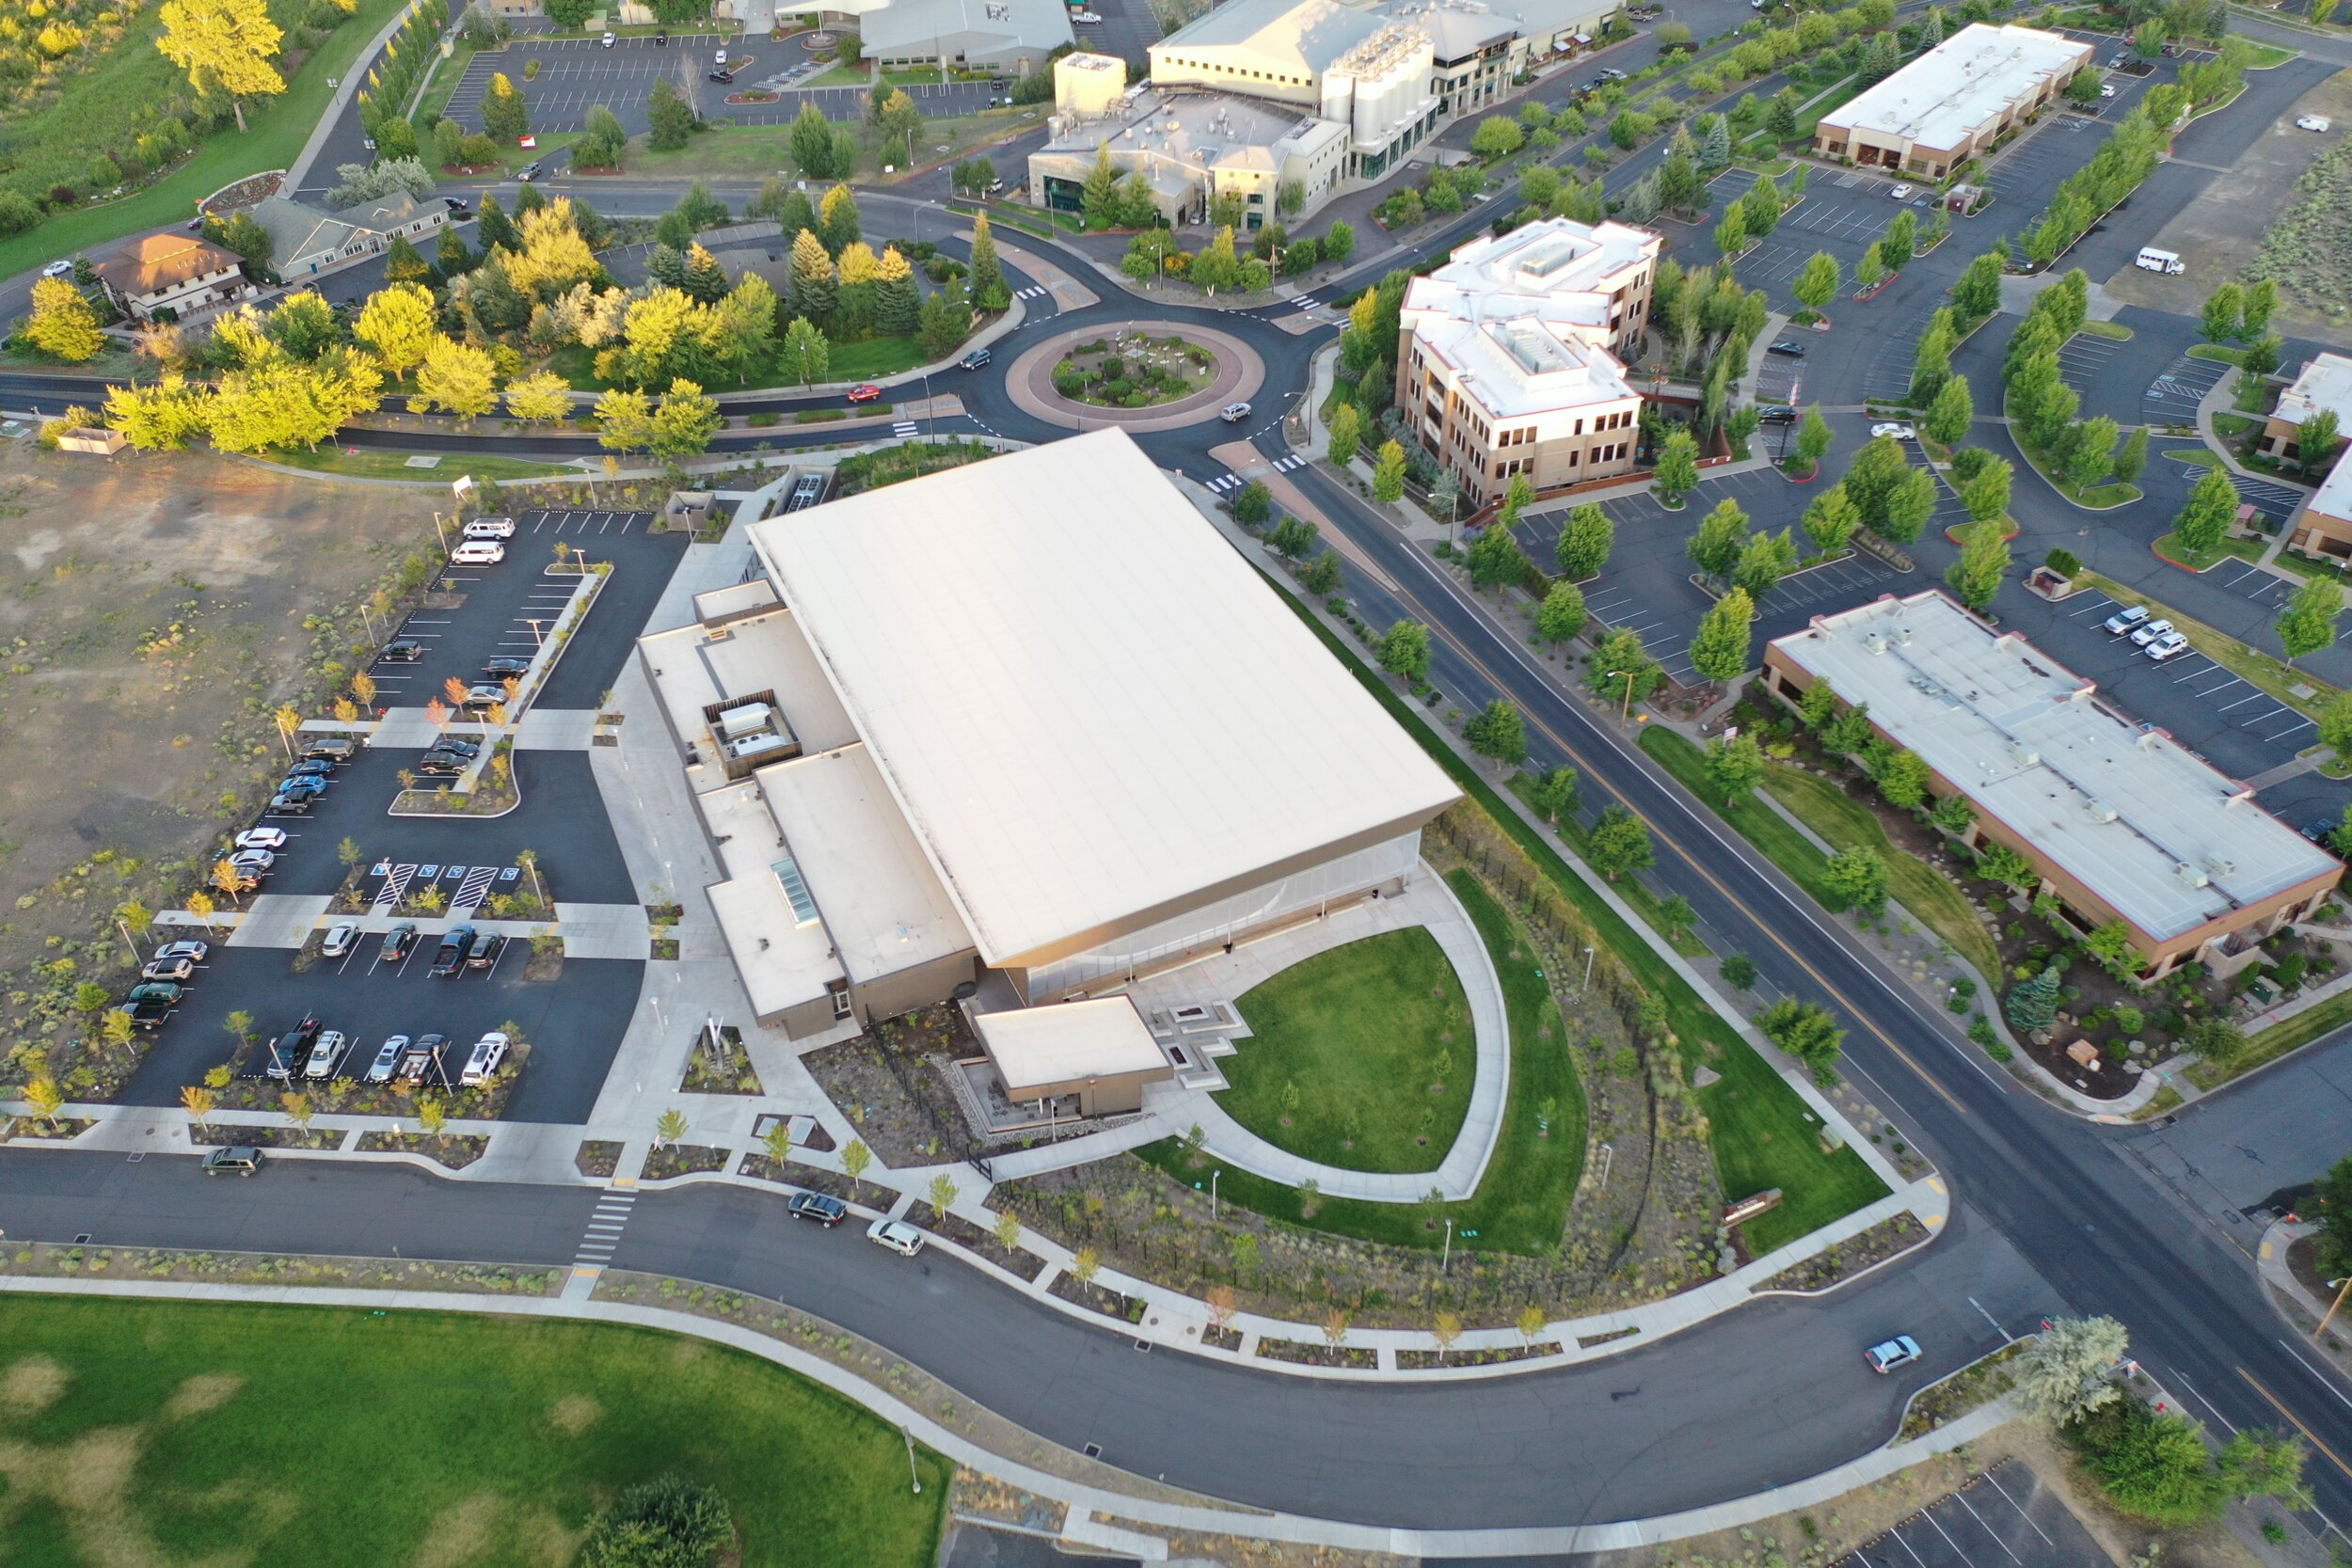 aerial_view_simpson_pavillion_circulation_roads_sidewalk.JPG